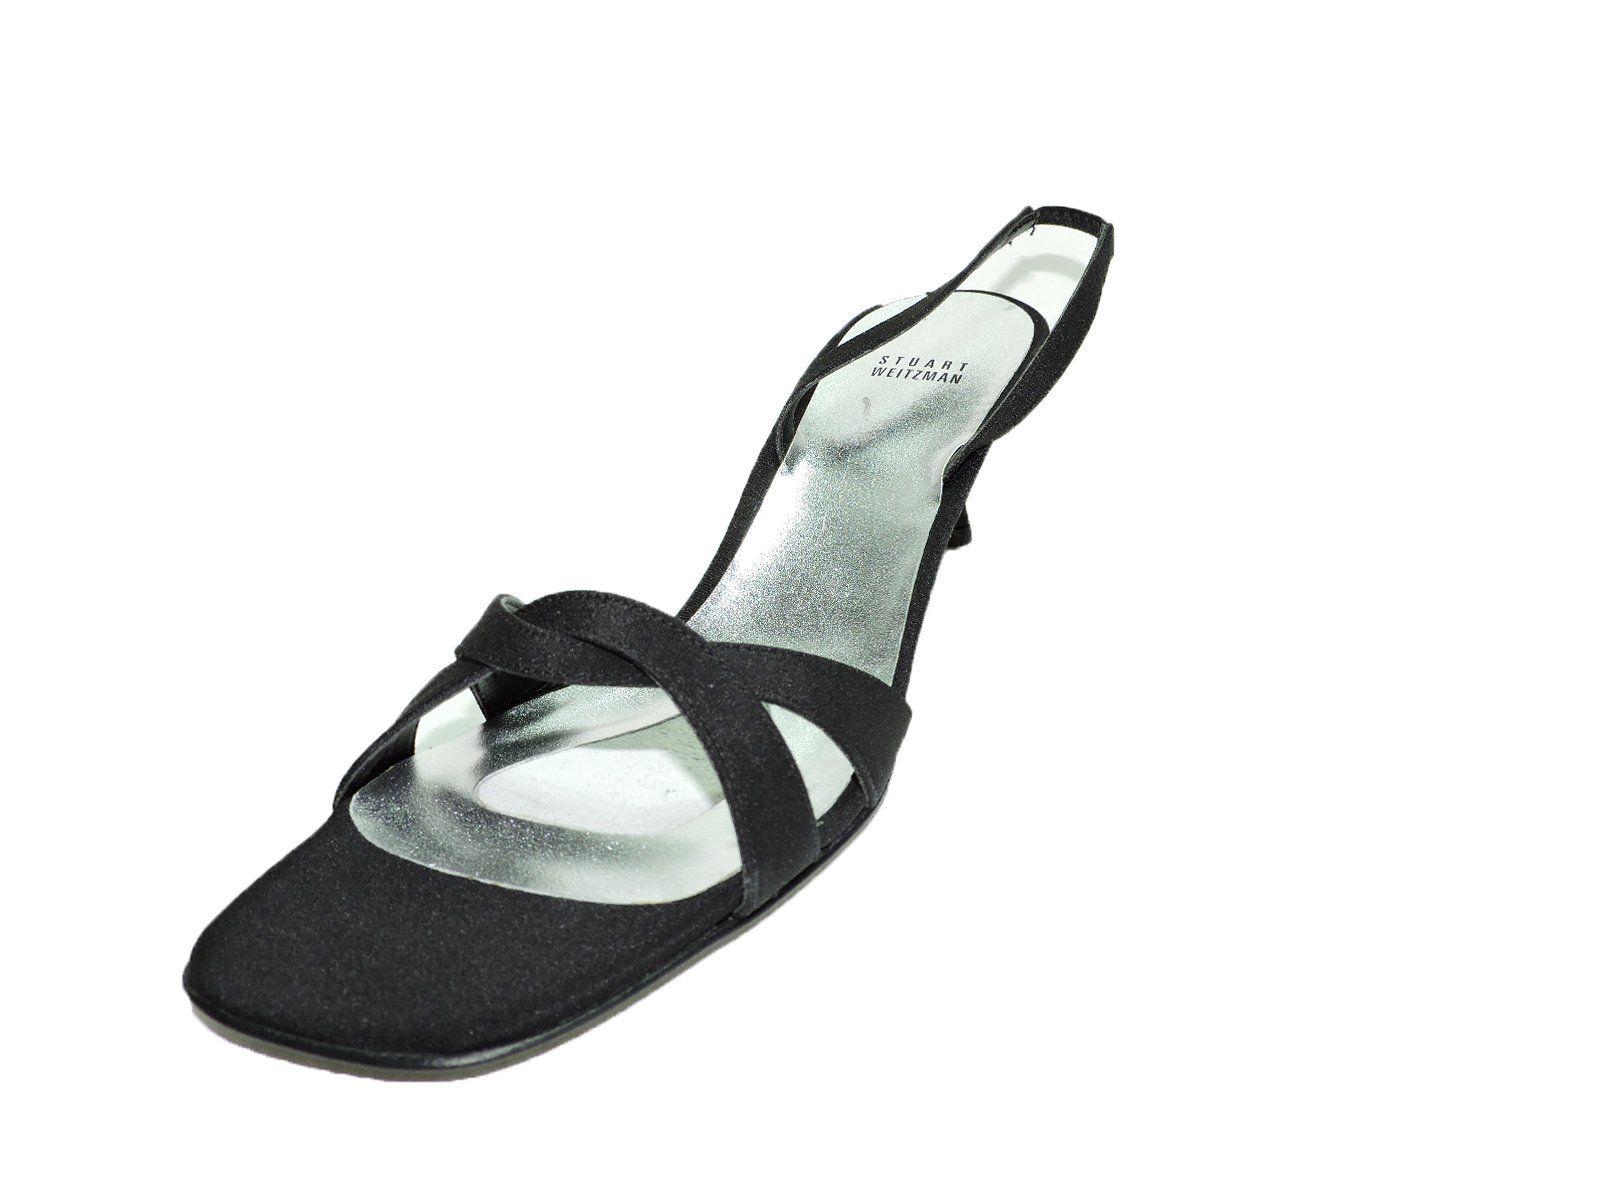 Womens sandals in size 12 - Stuart Weitzman Womens Waves Black Strappy Fabric Heels Sandals Open Toe Size 12 N